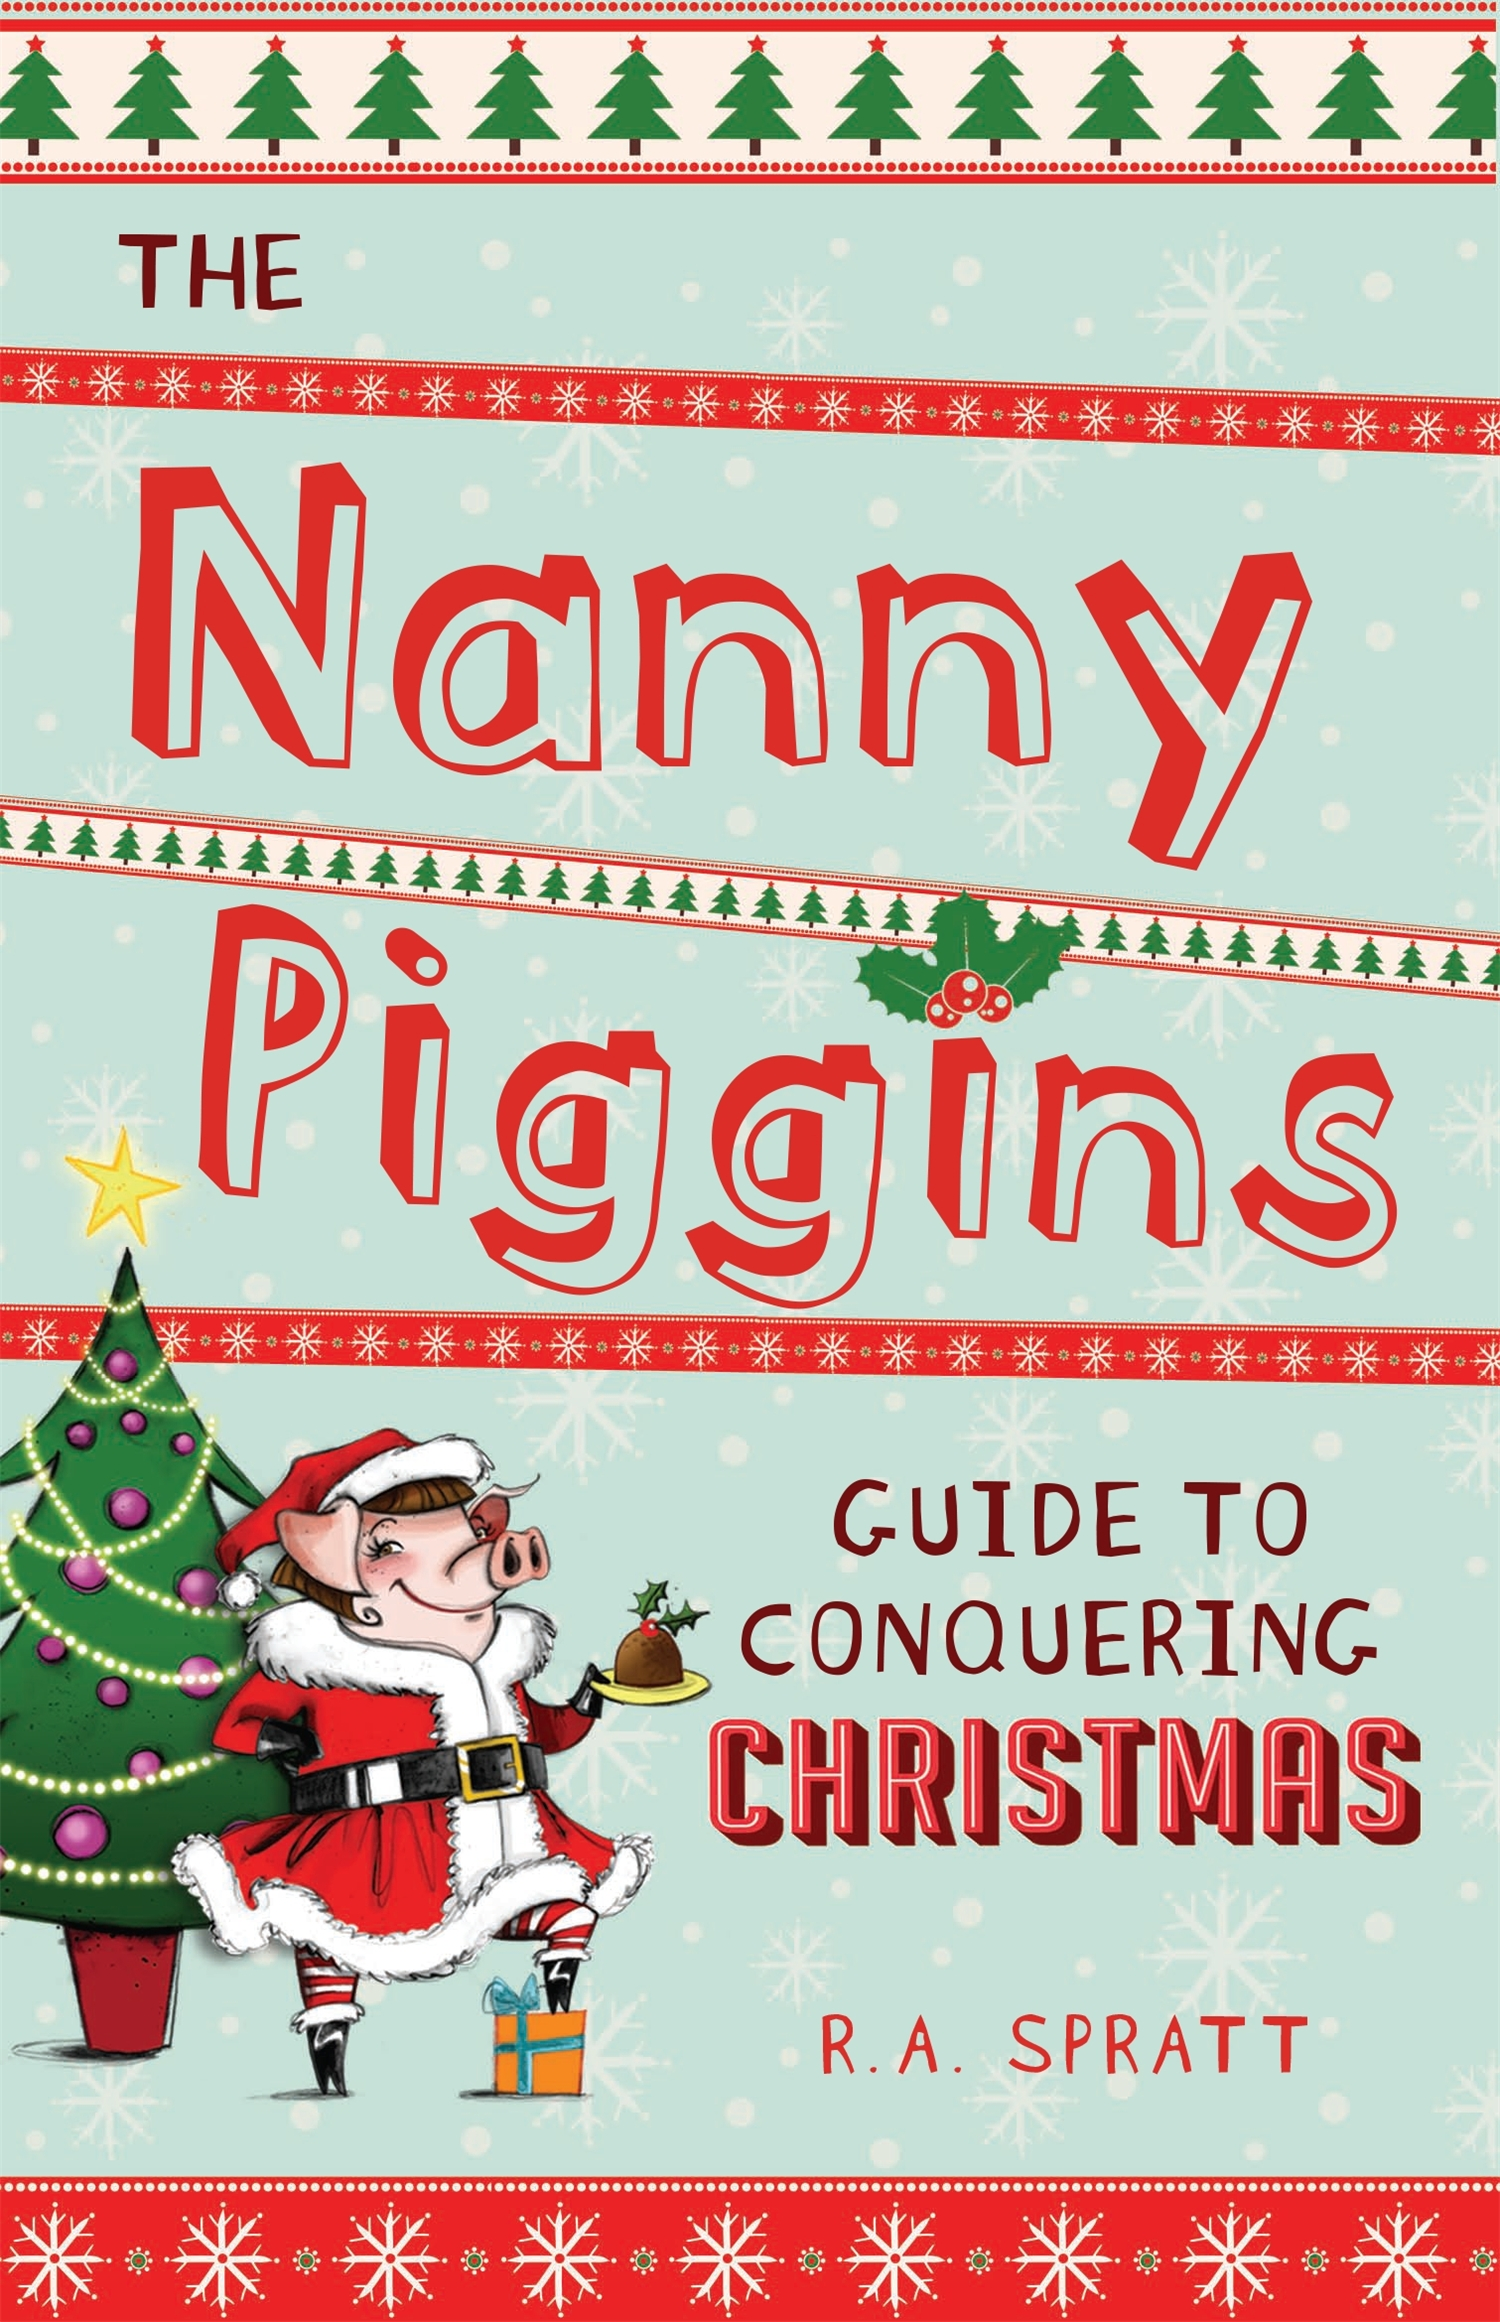 Nanny Piggins – R.A. Spratt